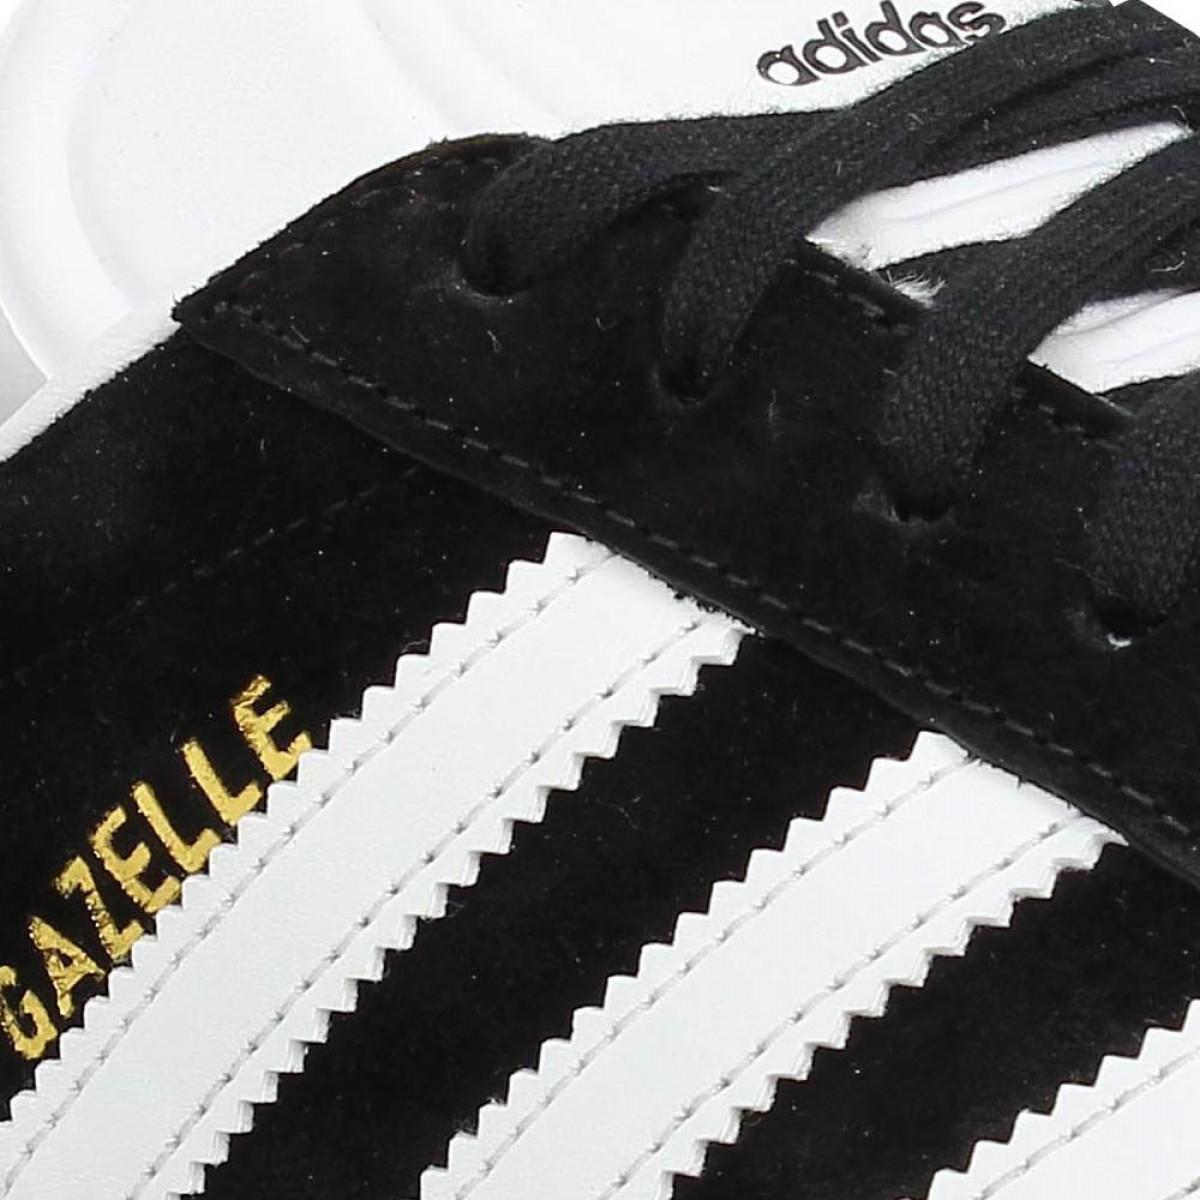 Adidas gazelle velours femme noir blanc | Fanny chaussures